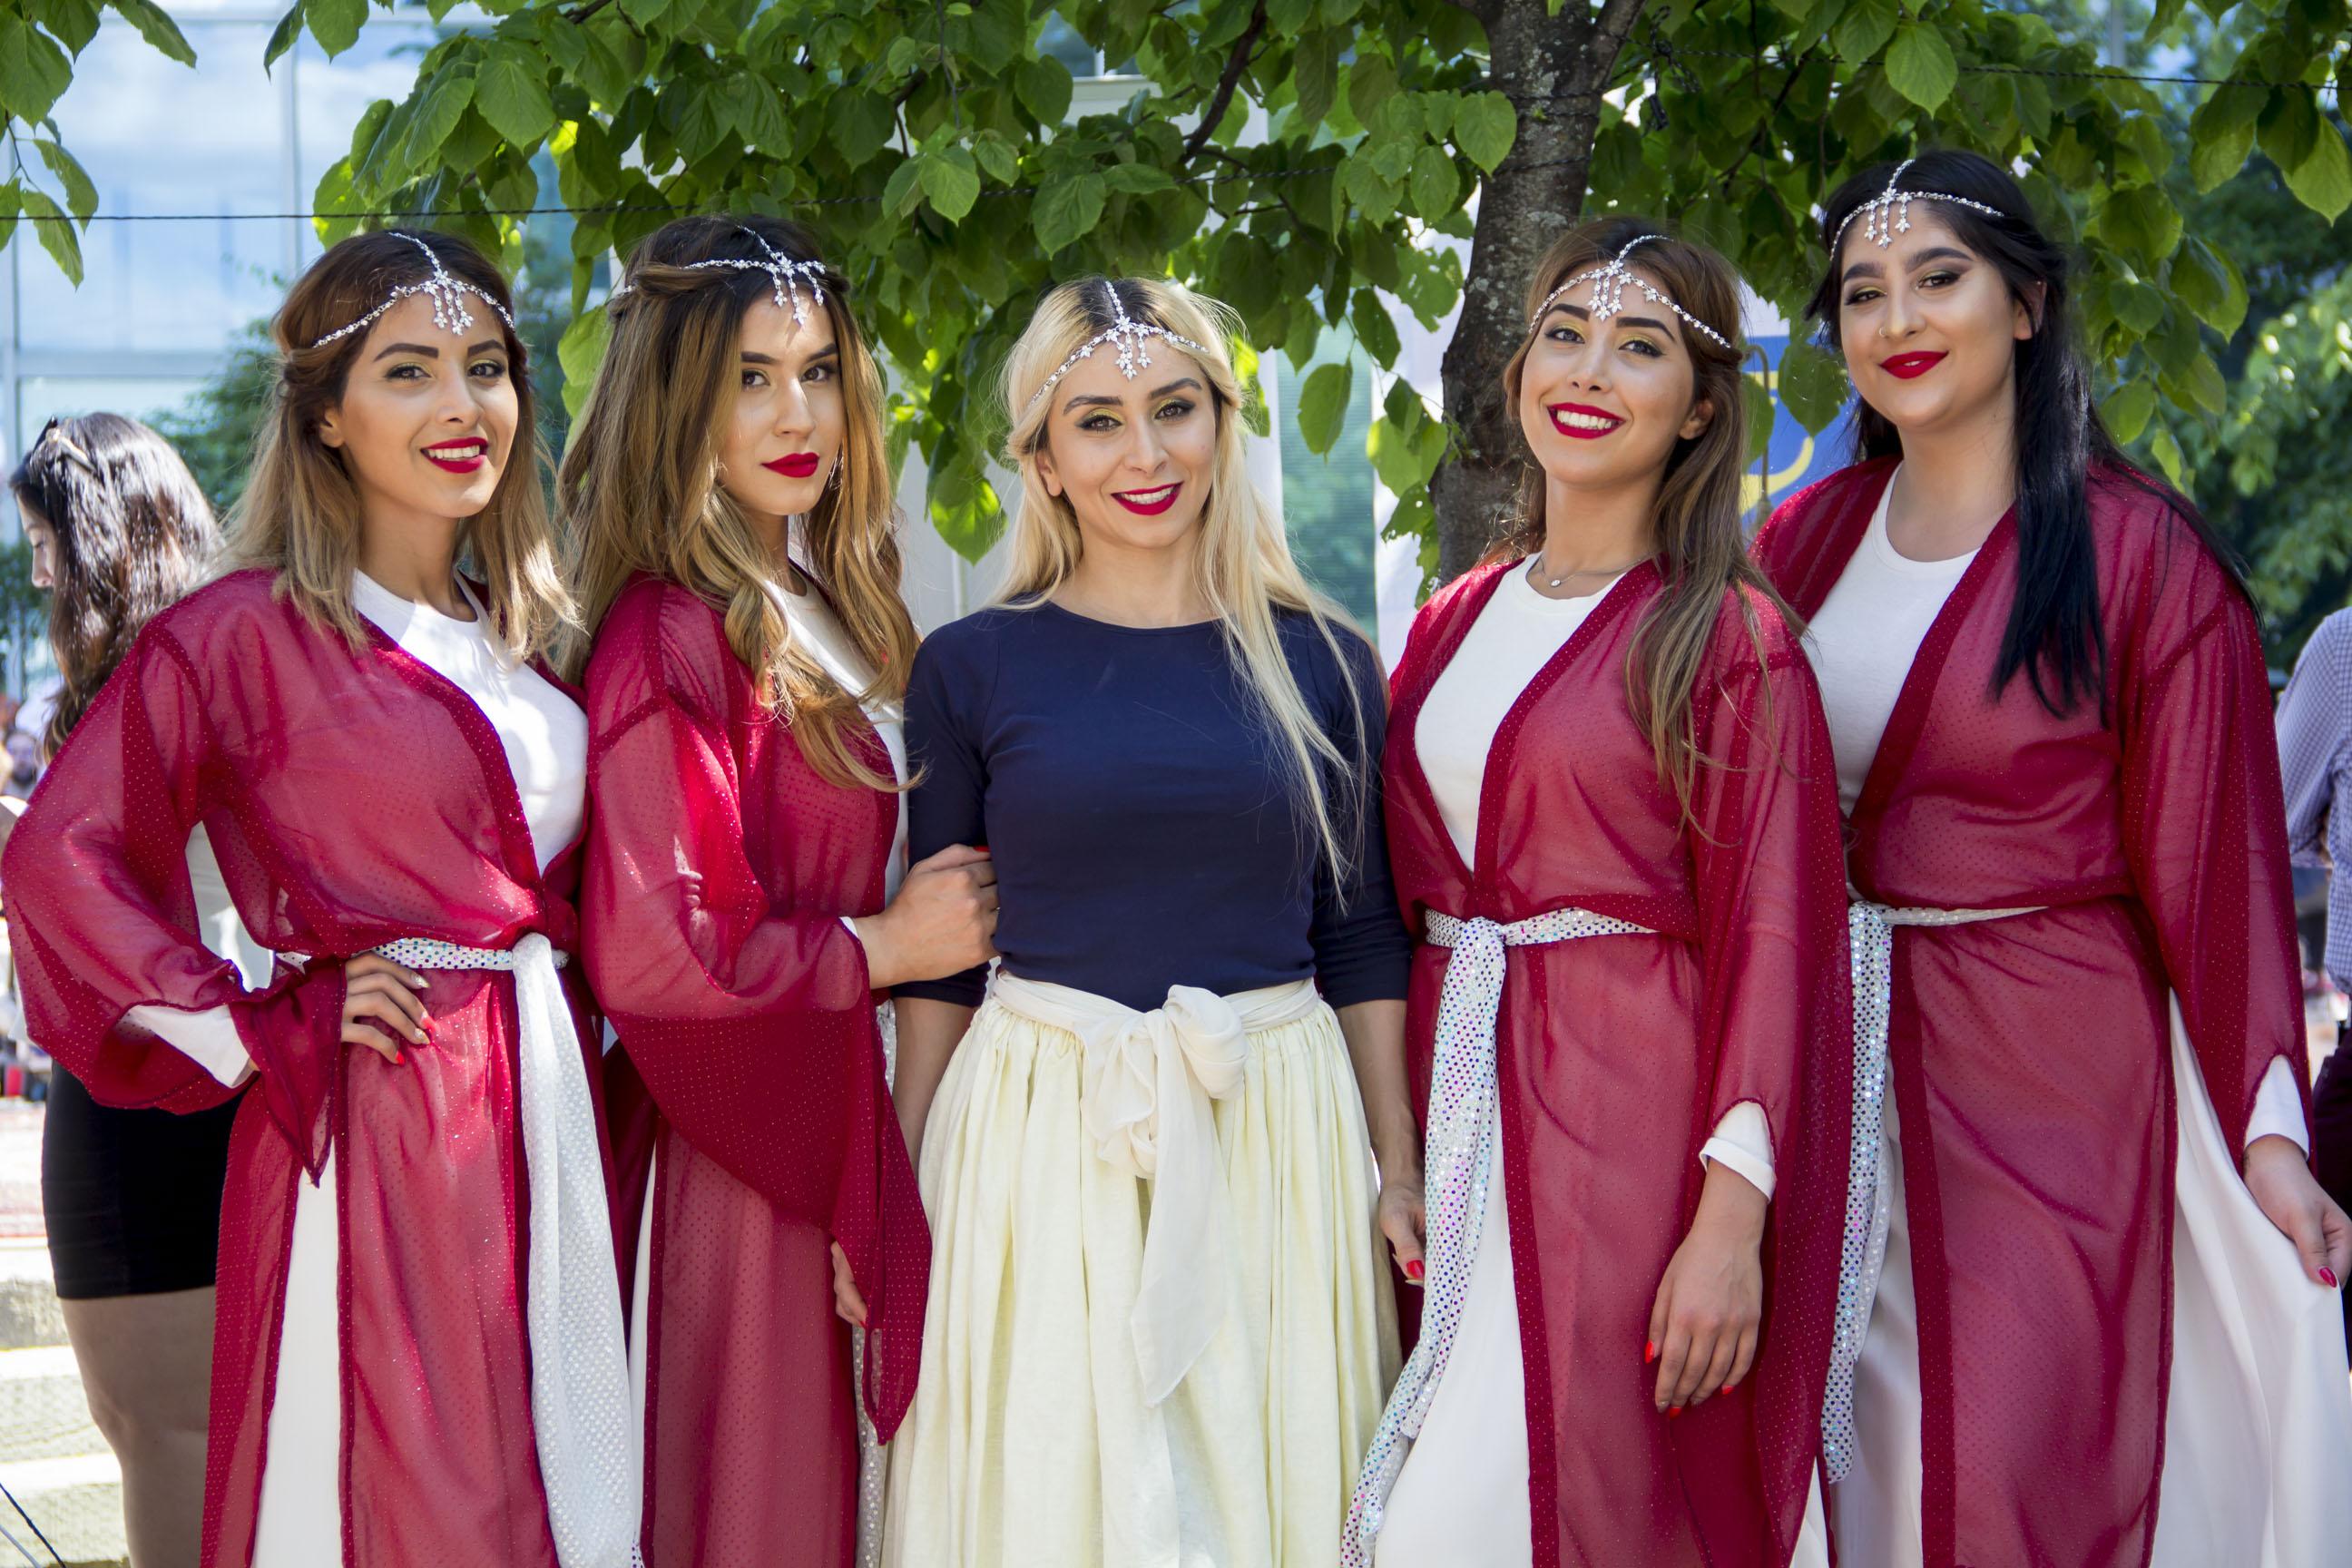 Atousa, Ghazal, Maral, Anahita, Rojina